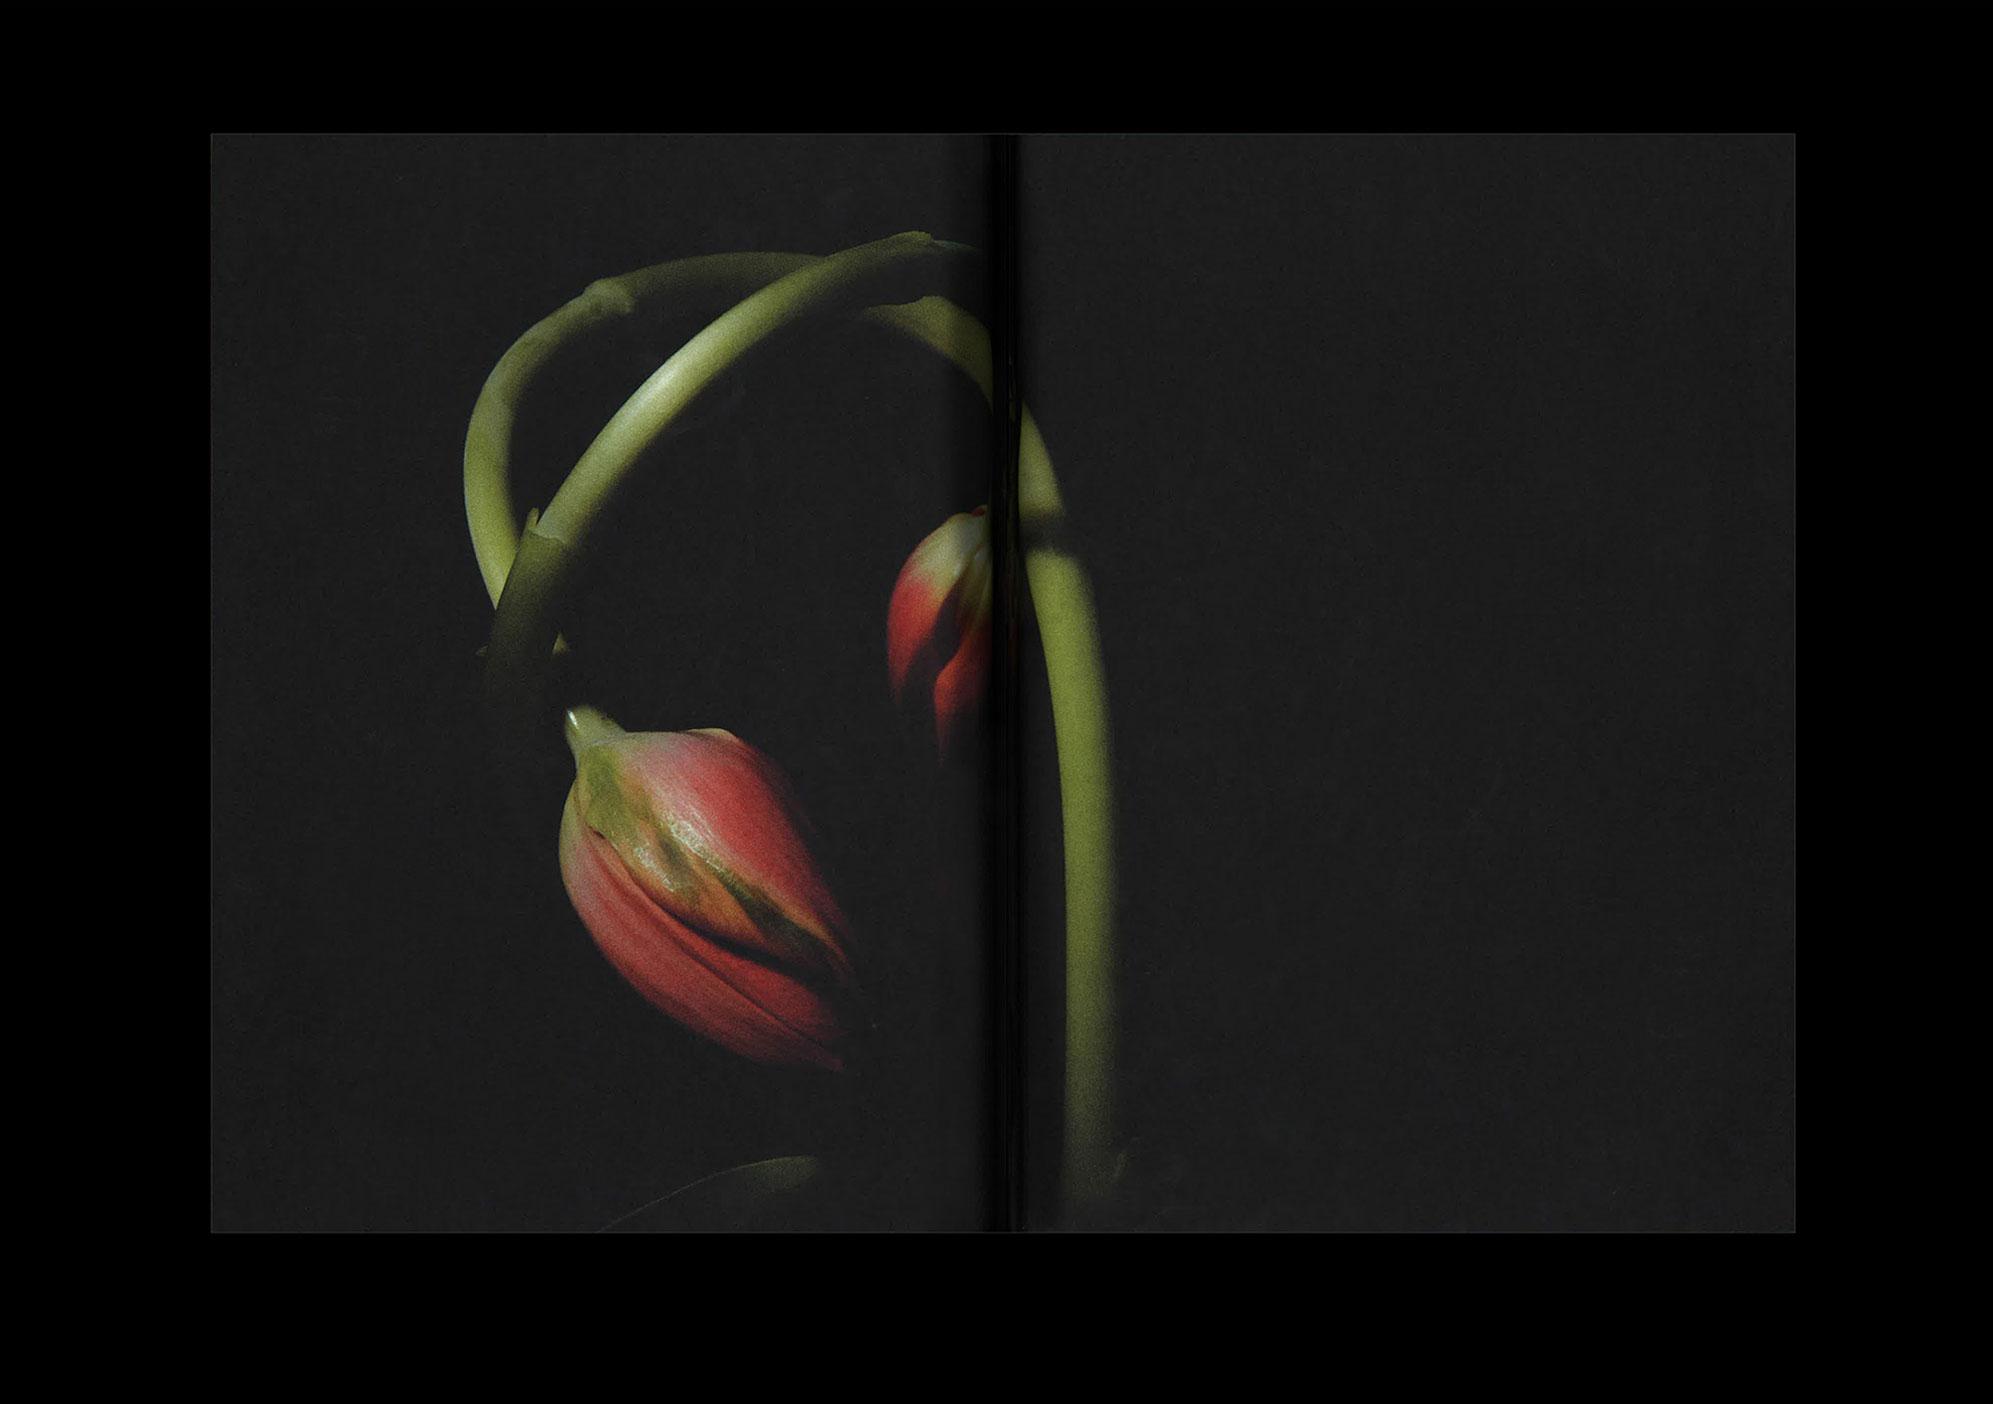 RJ_Semplice_flowers_02_taller_@2x